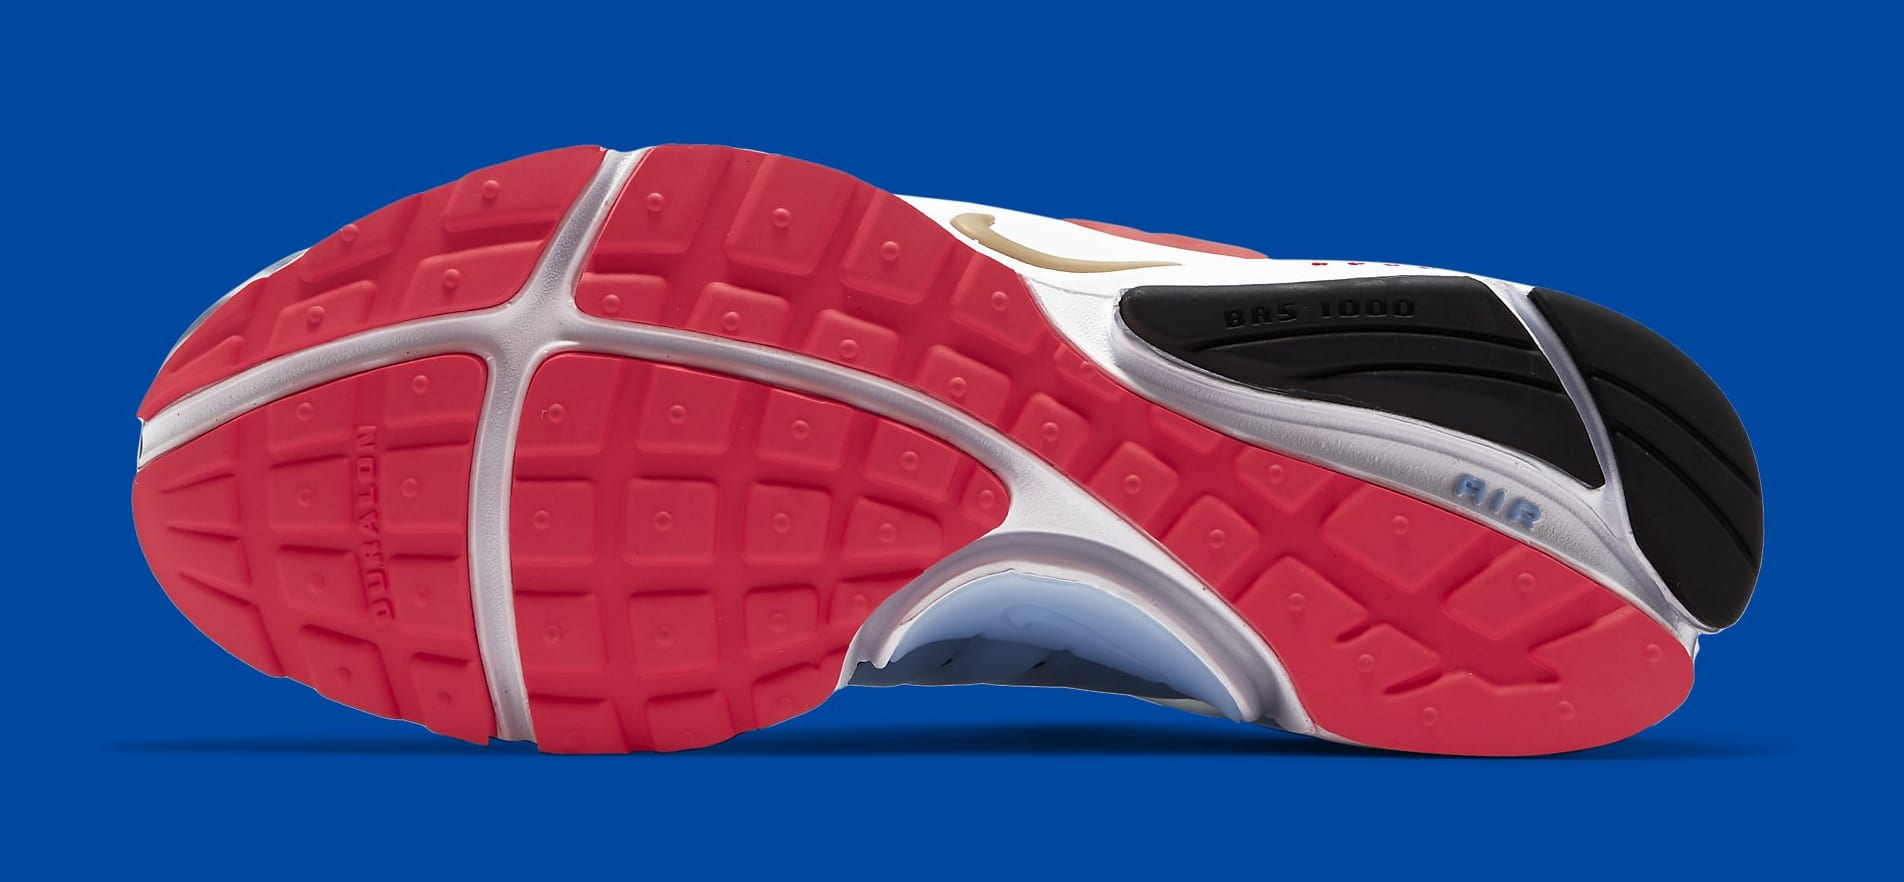 Nike Air Presto 'South Korea' CJ1229-100 Outsole